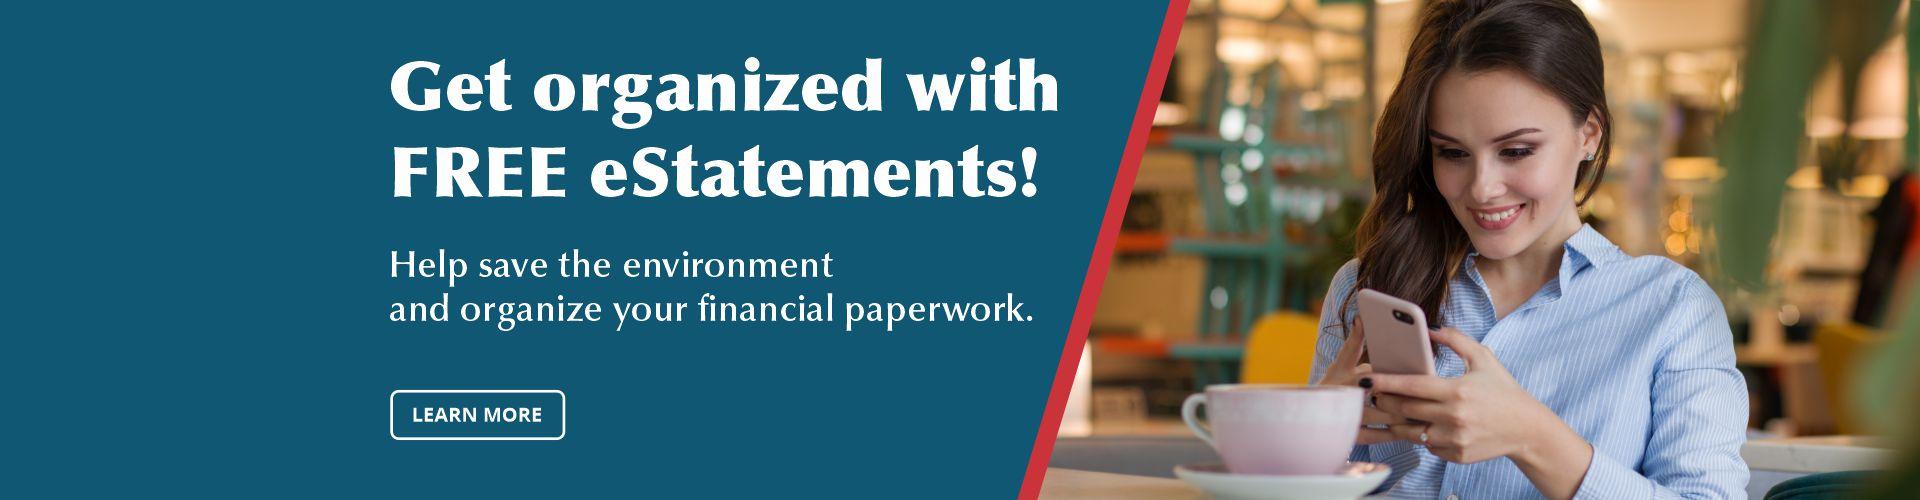 Get organized with free eStatements